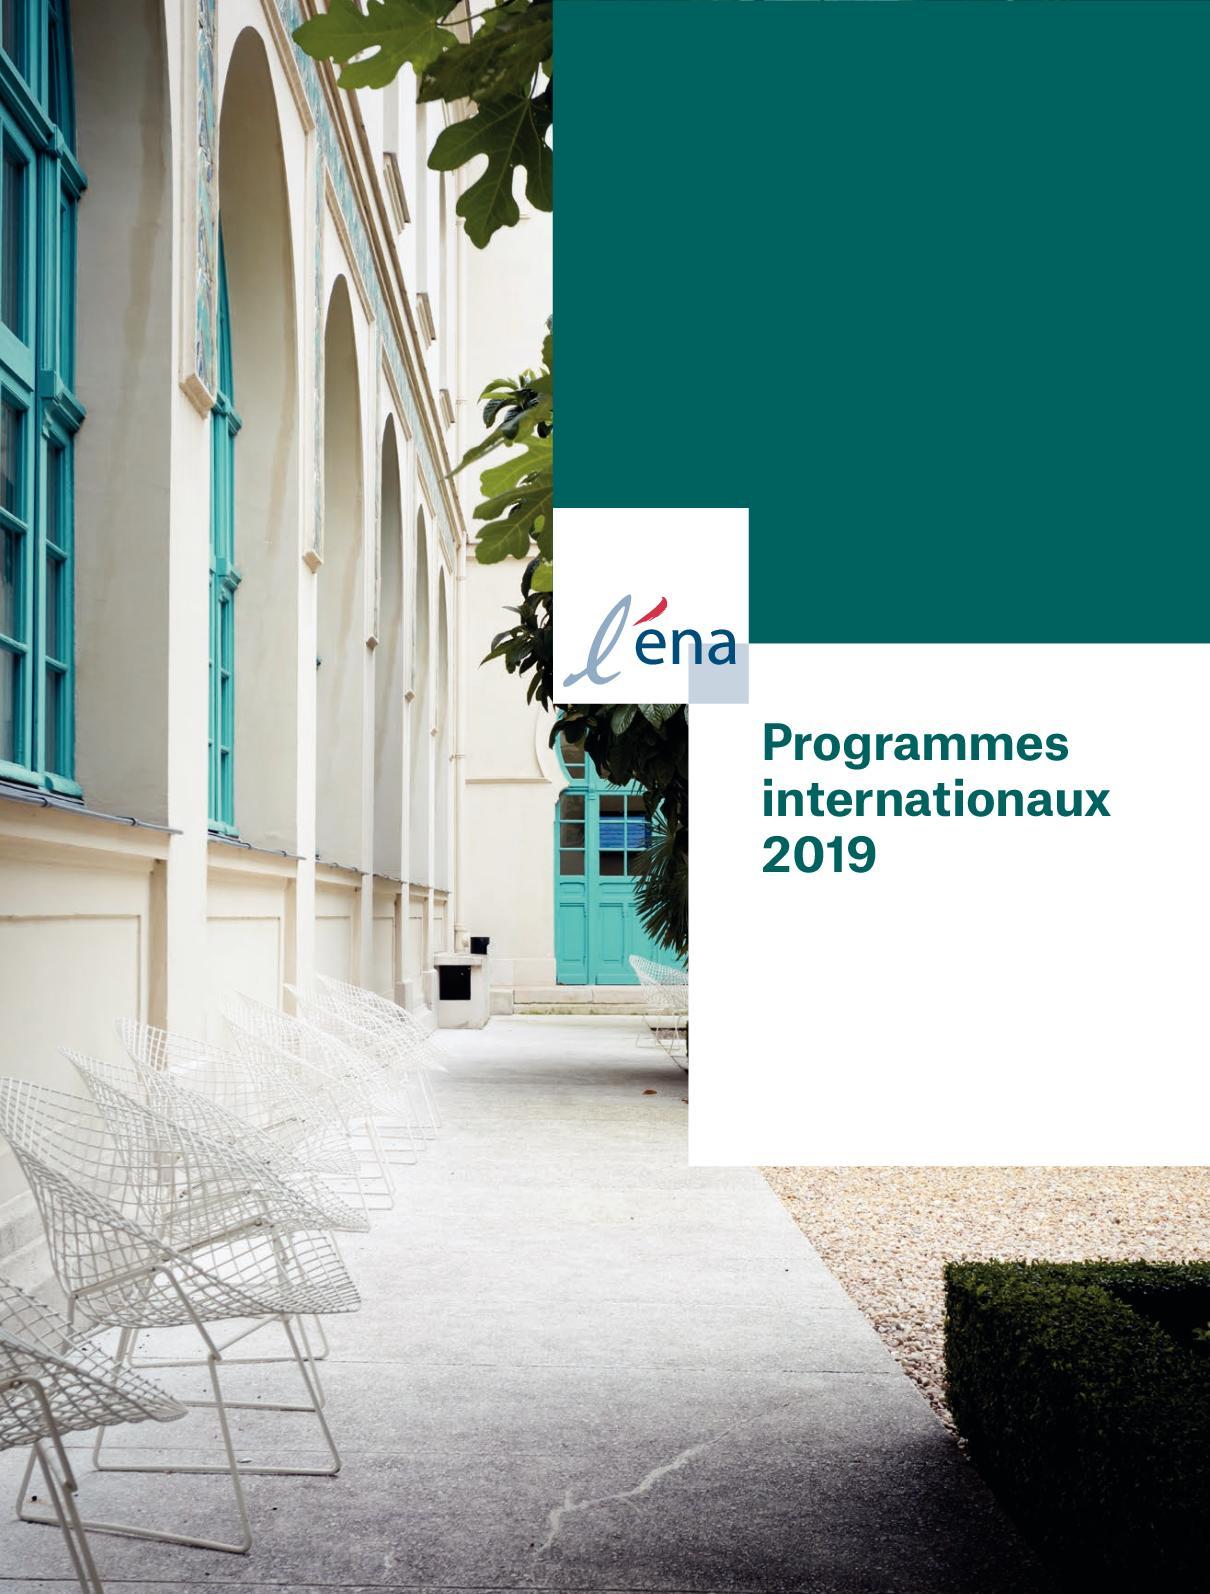 Programmes internationaux courts 2019